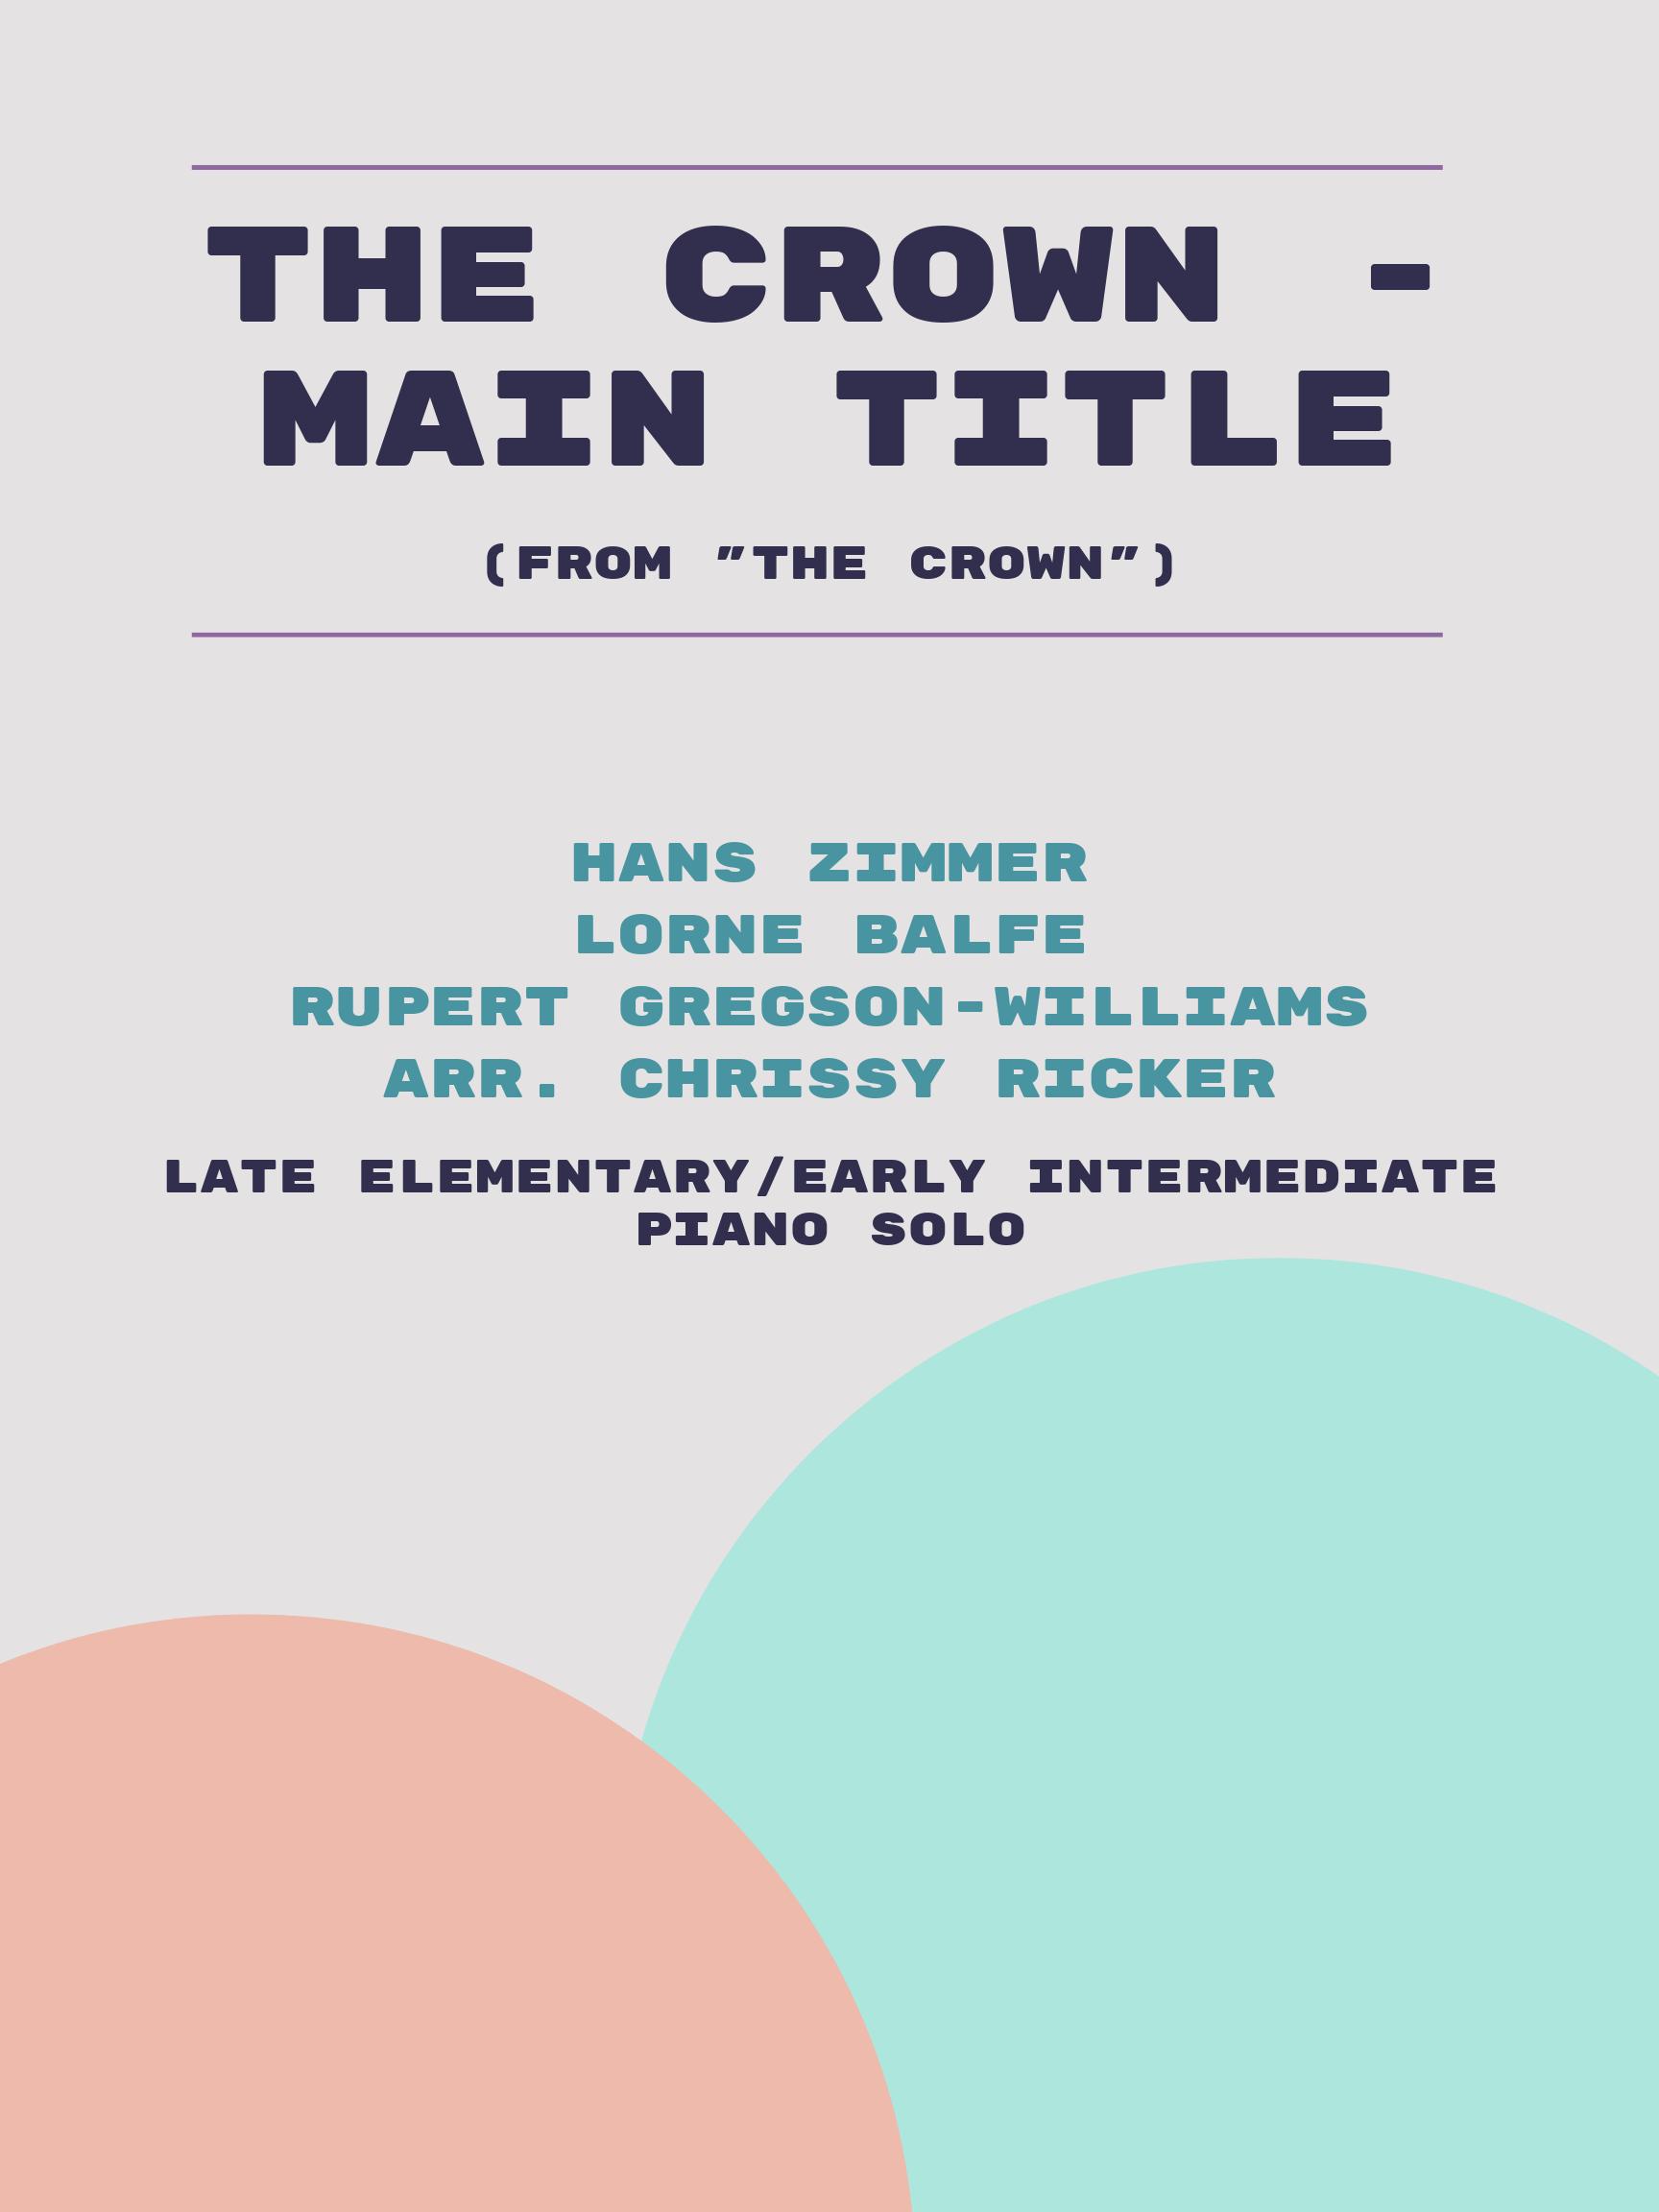 The Crown - Main Title by Hans Zimmer, Lorne Balfe, Rupert Gregson-Williams